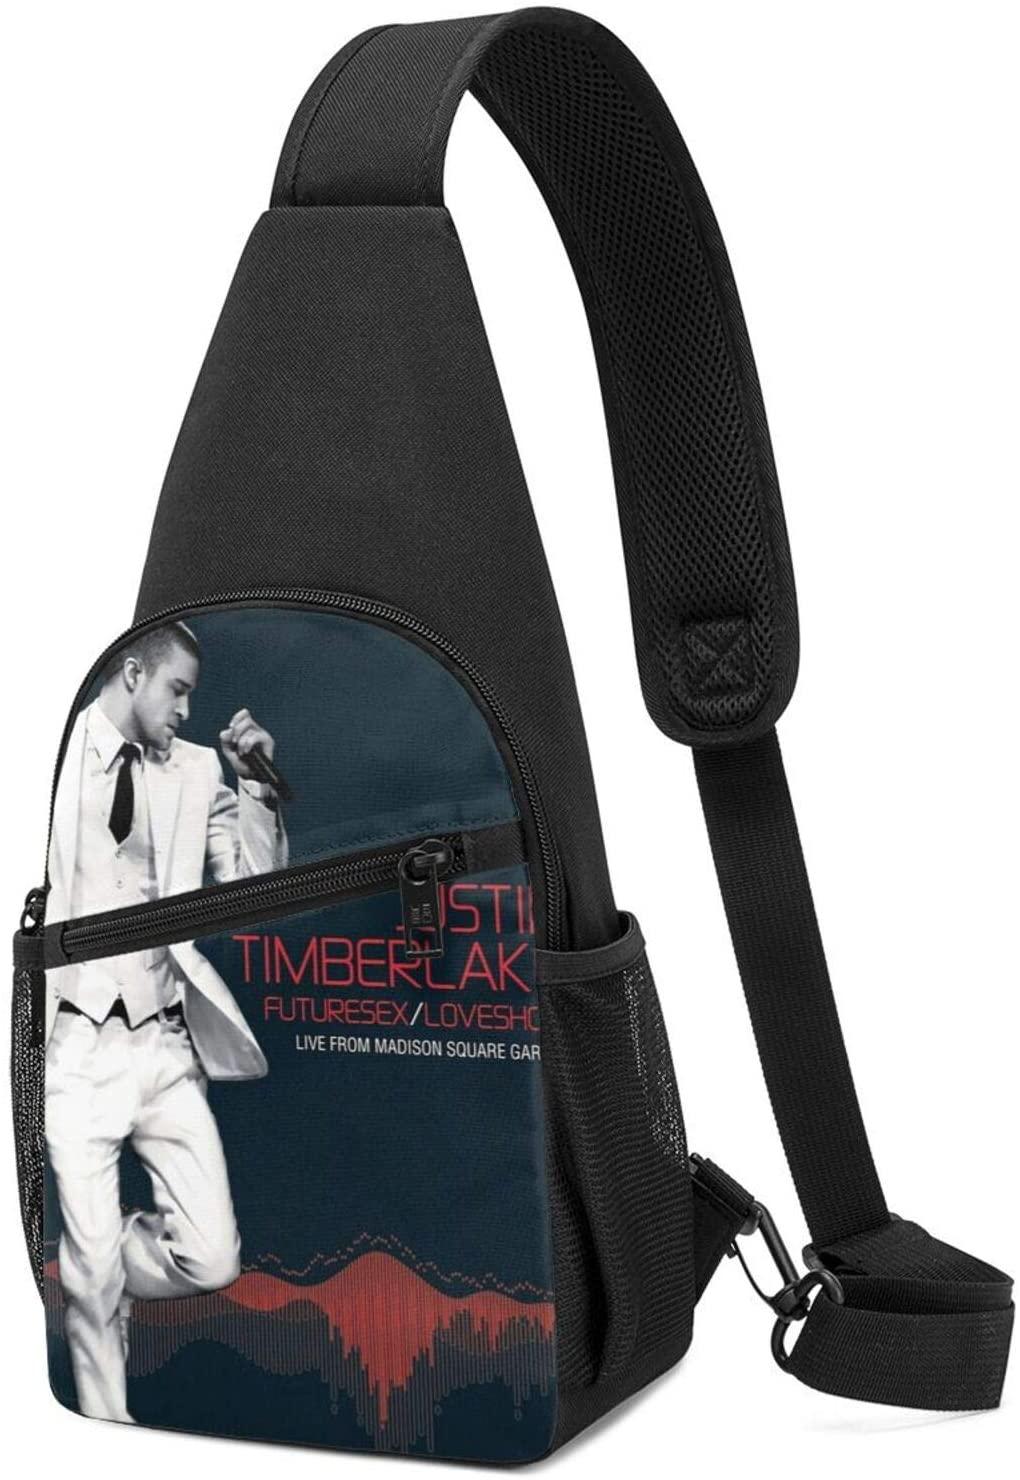 AsziSham Justin Timberlake Men Women Sling Bag Chest Shoulder Backpack Fanny Pack Crossbody Bags Black